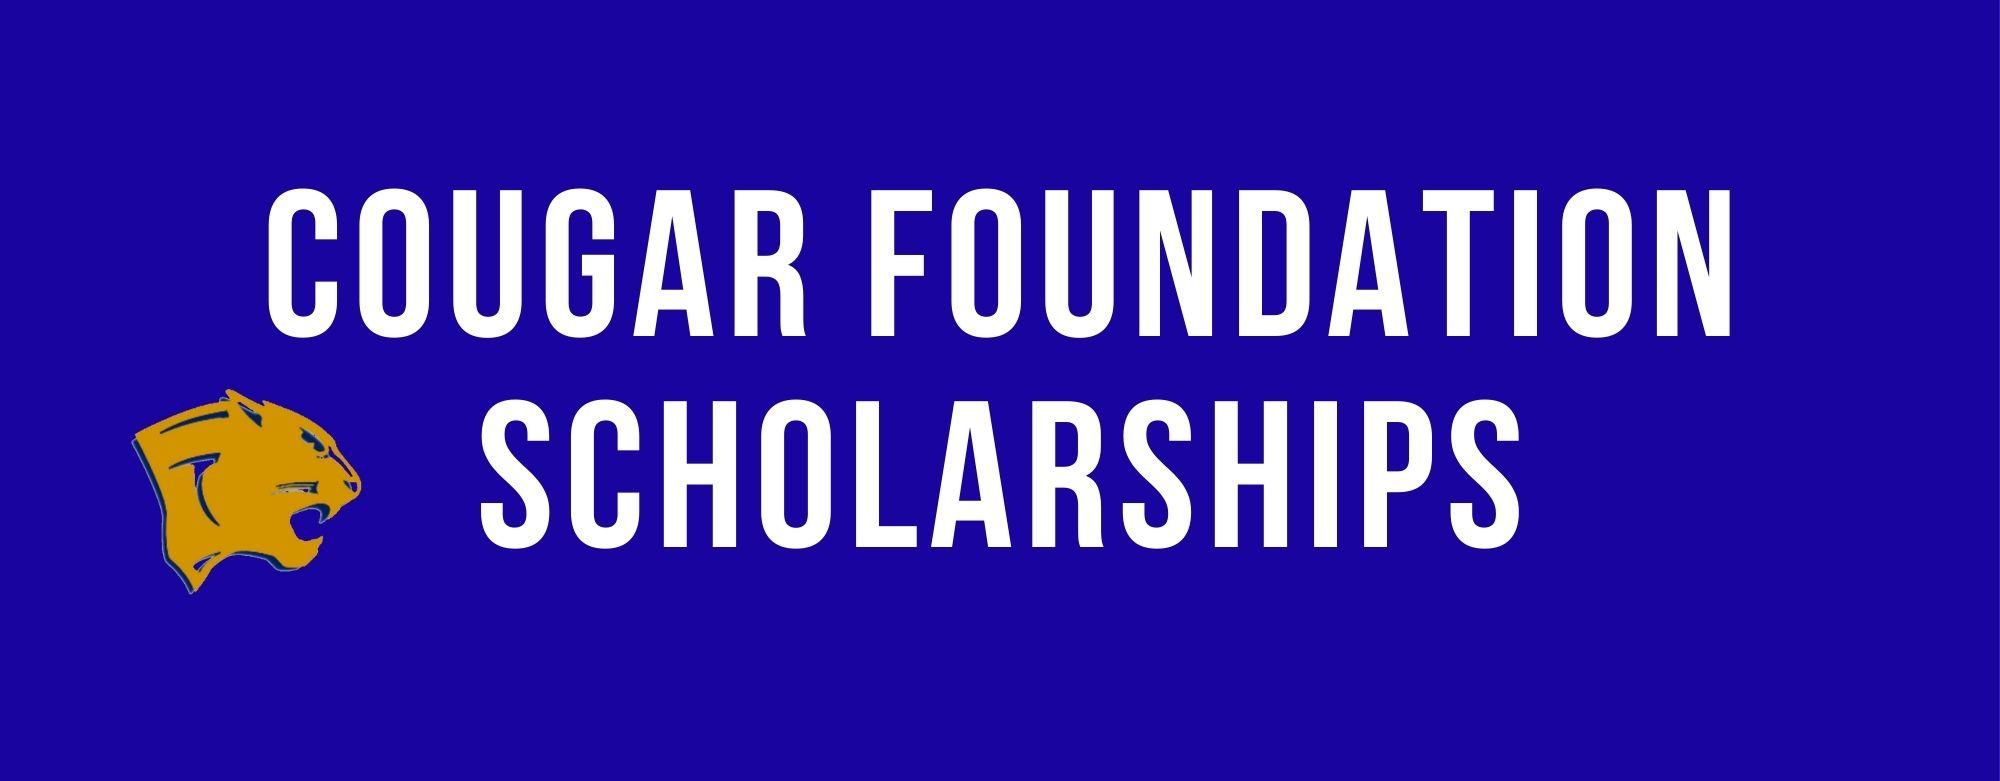 Cougar Foundation Scholarships banner